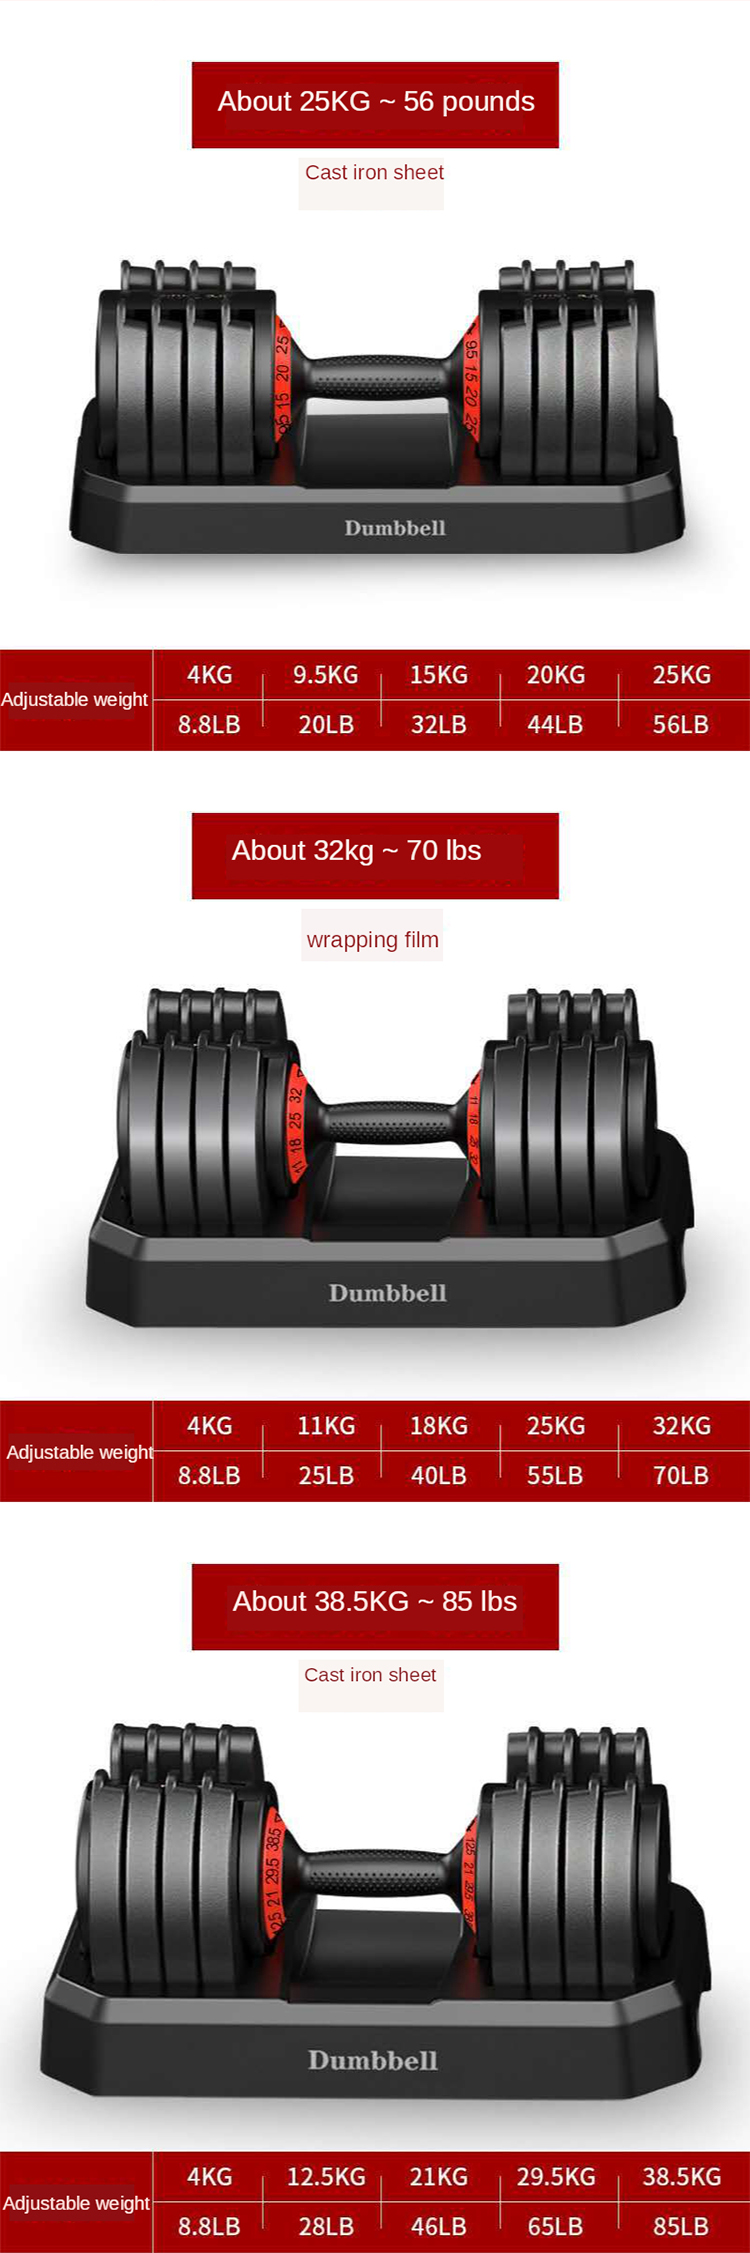 Basso prezzo di 40 kg manubri regolabili set 32 20kg dumbells Migliore